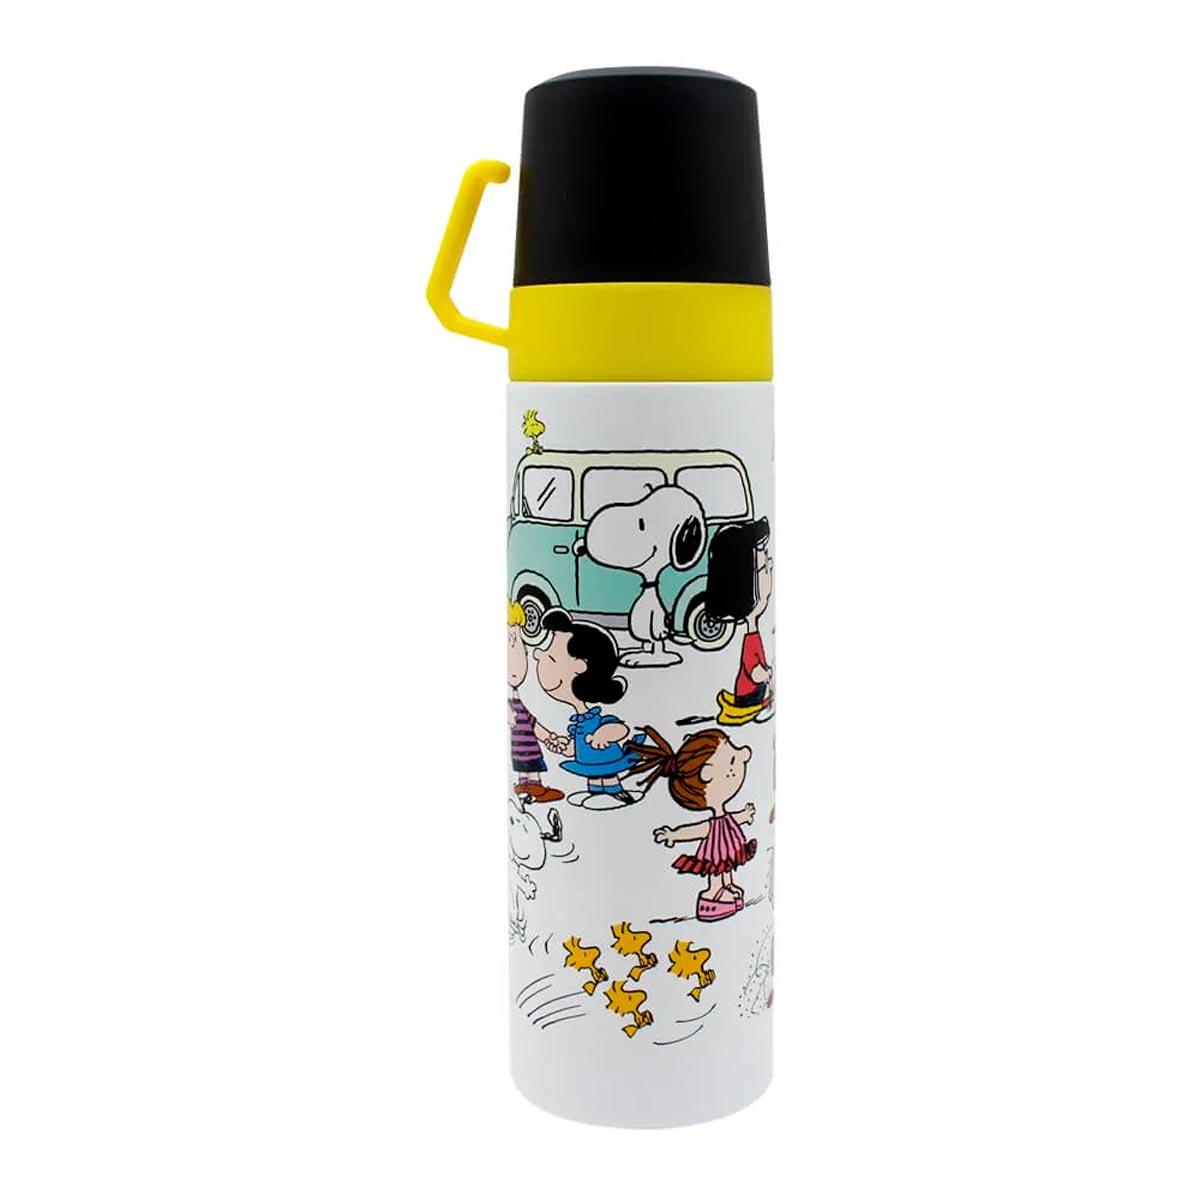 Garrafa Térmica 500 ml com Caneca Turma Snoopy FBA